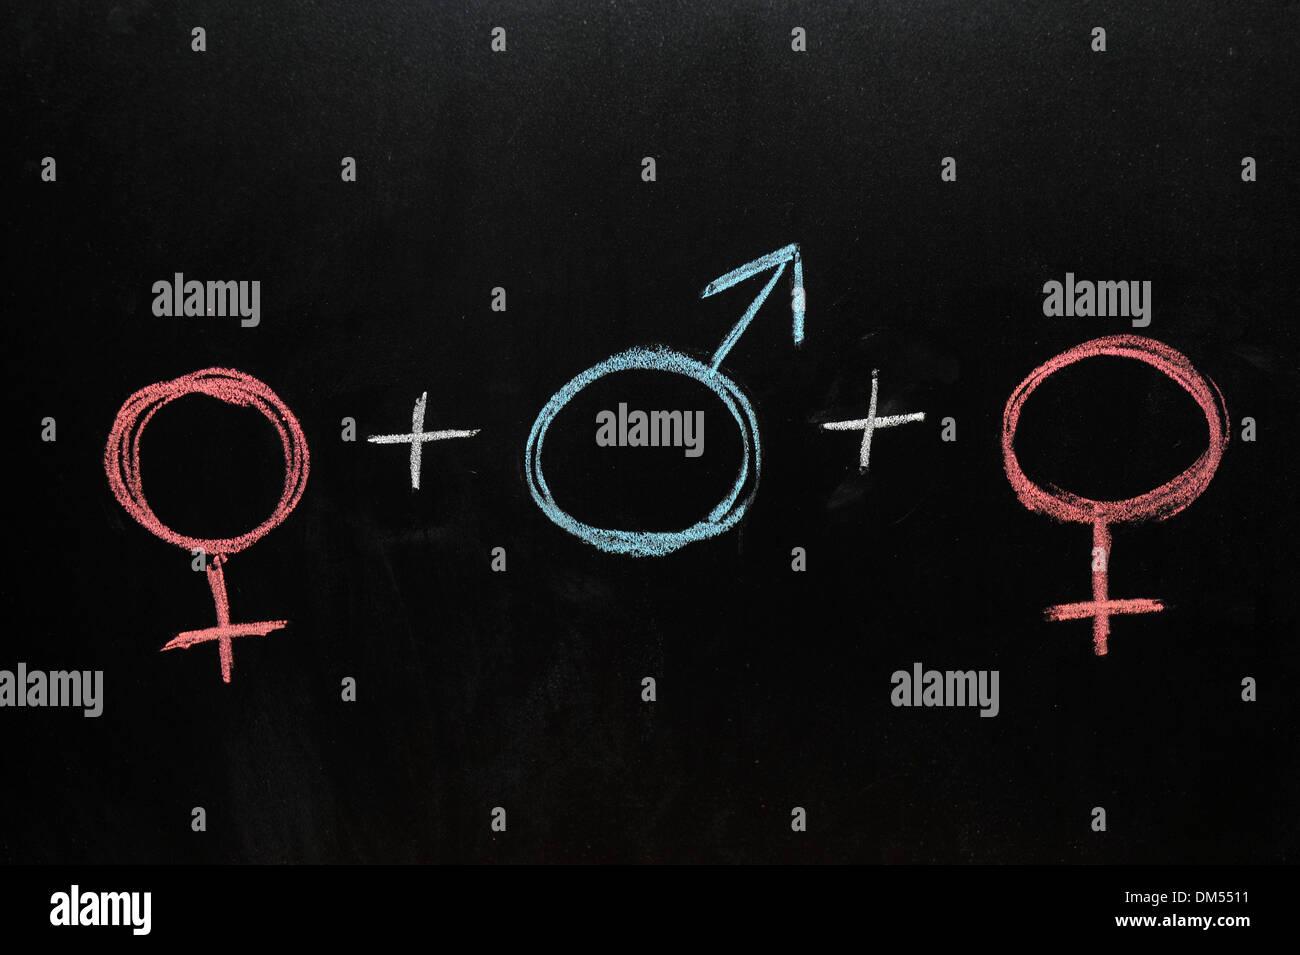 2 female and 1 male gender symbols drawn on a blackboard in chalk.